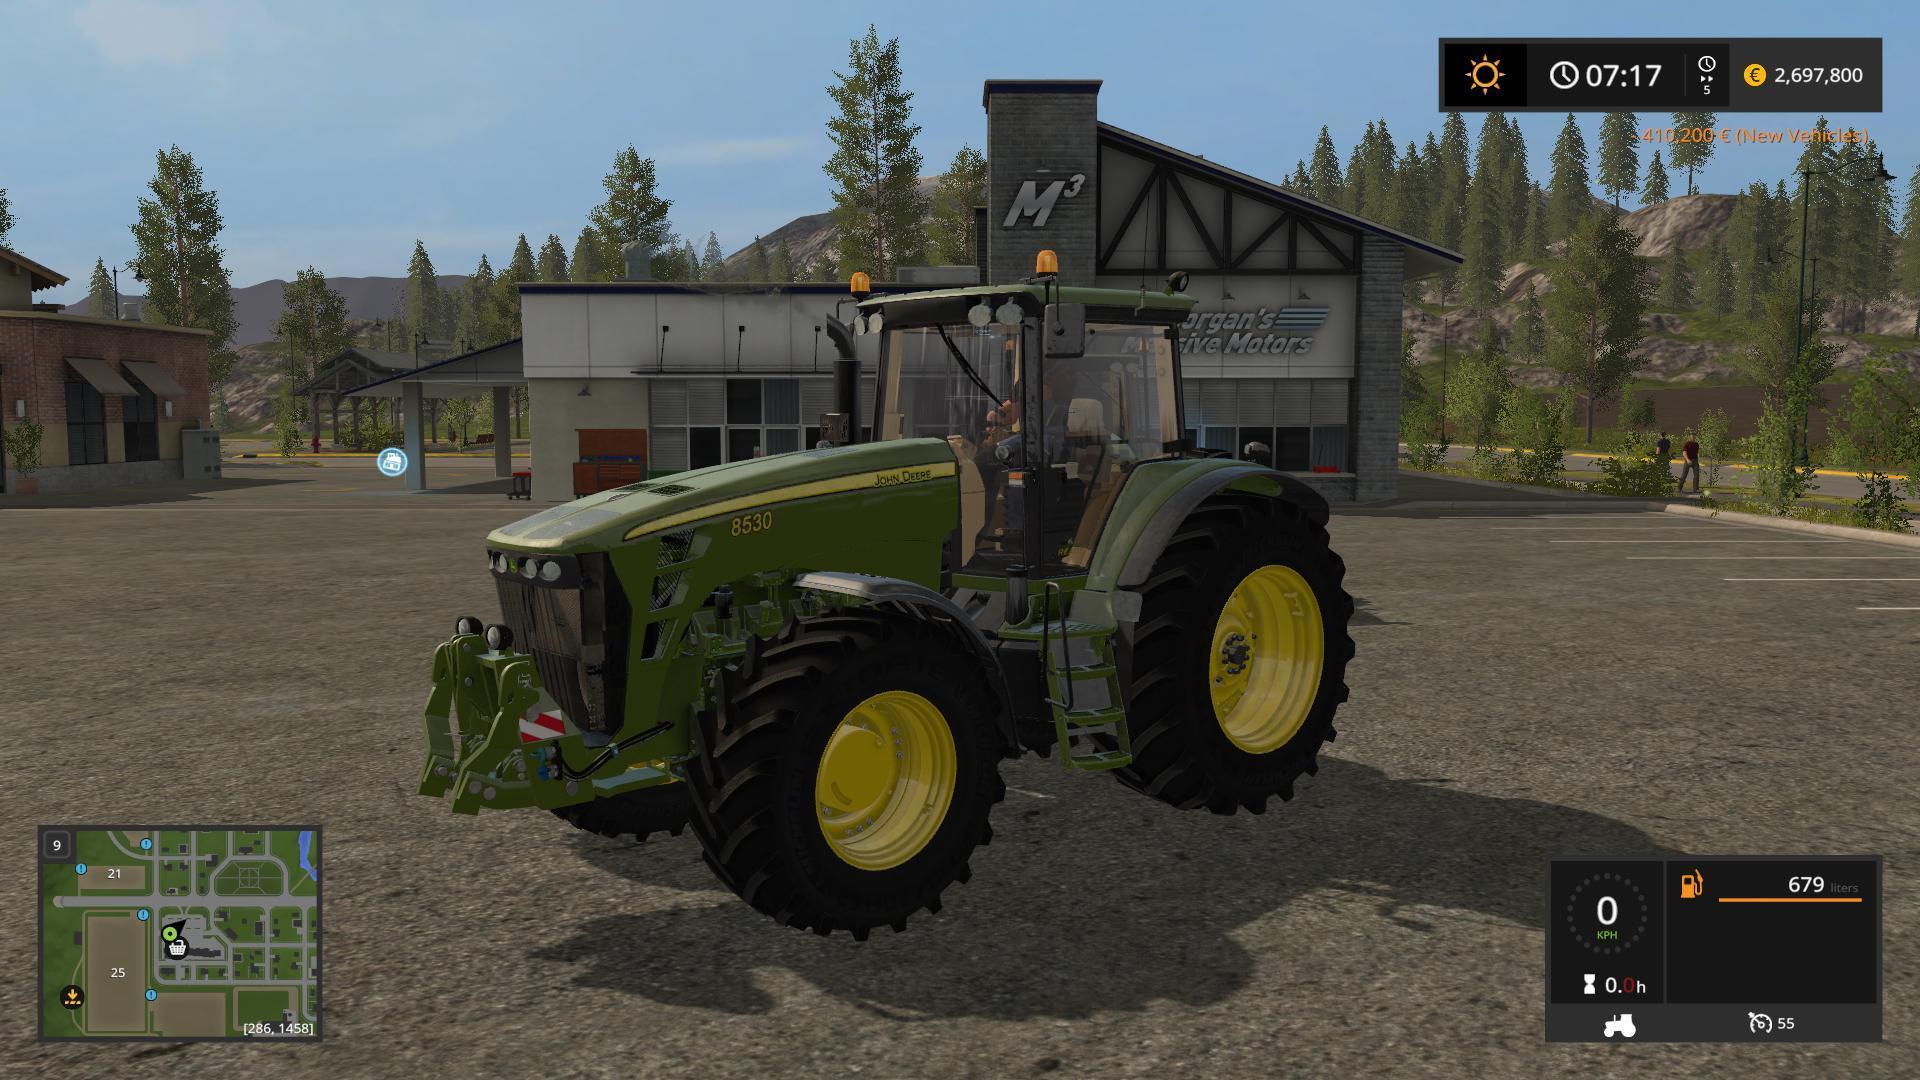 John Deere 8530 Bd V10 Fs17 Farming Simulator 17 Mod Fs 2017 Mod